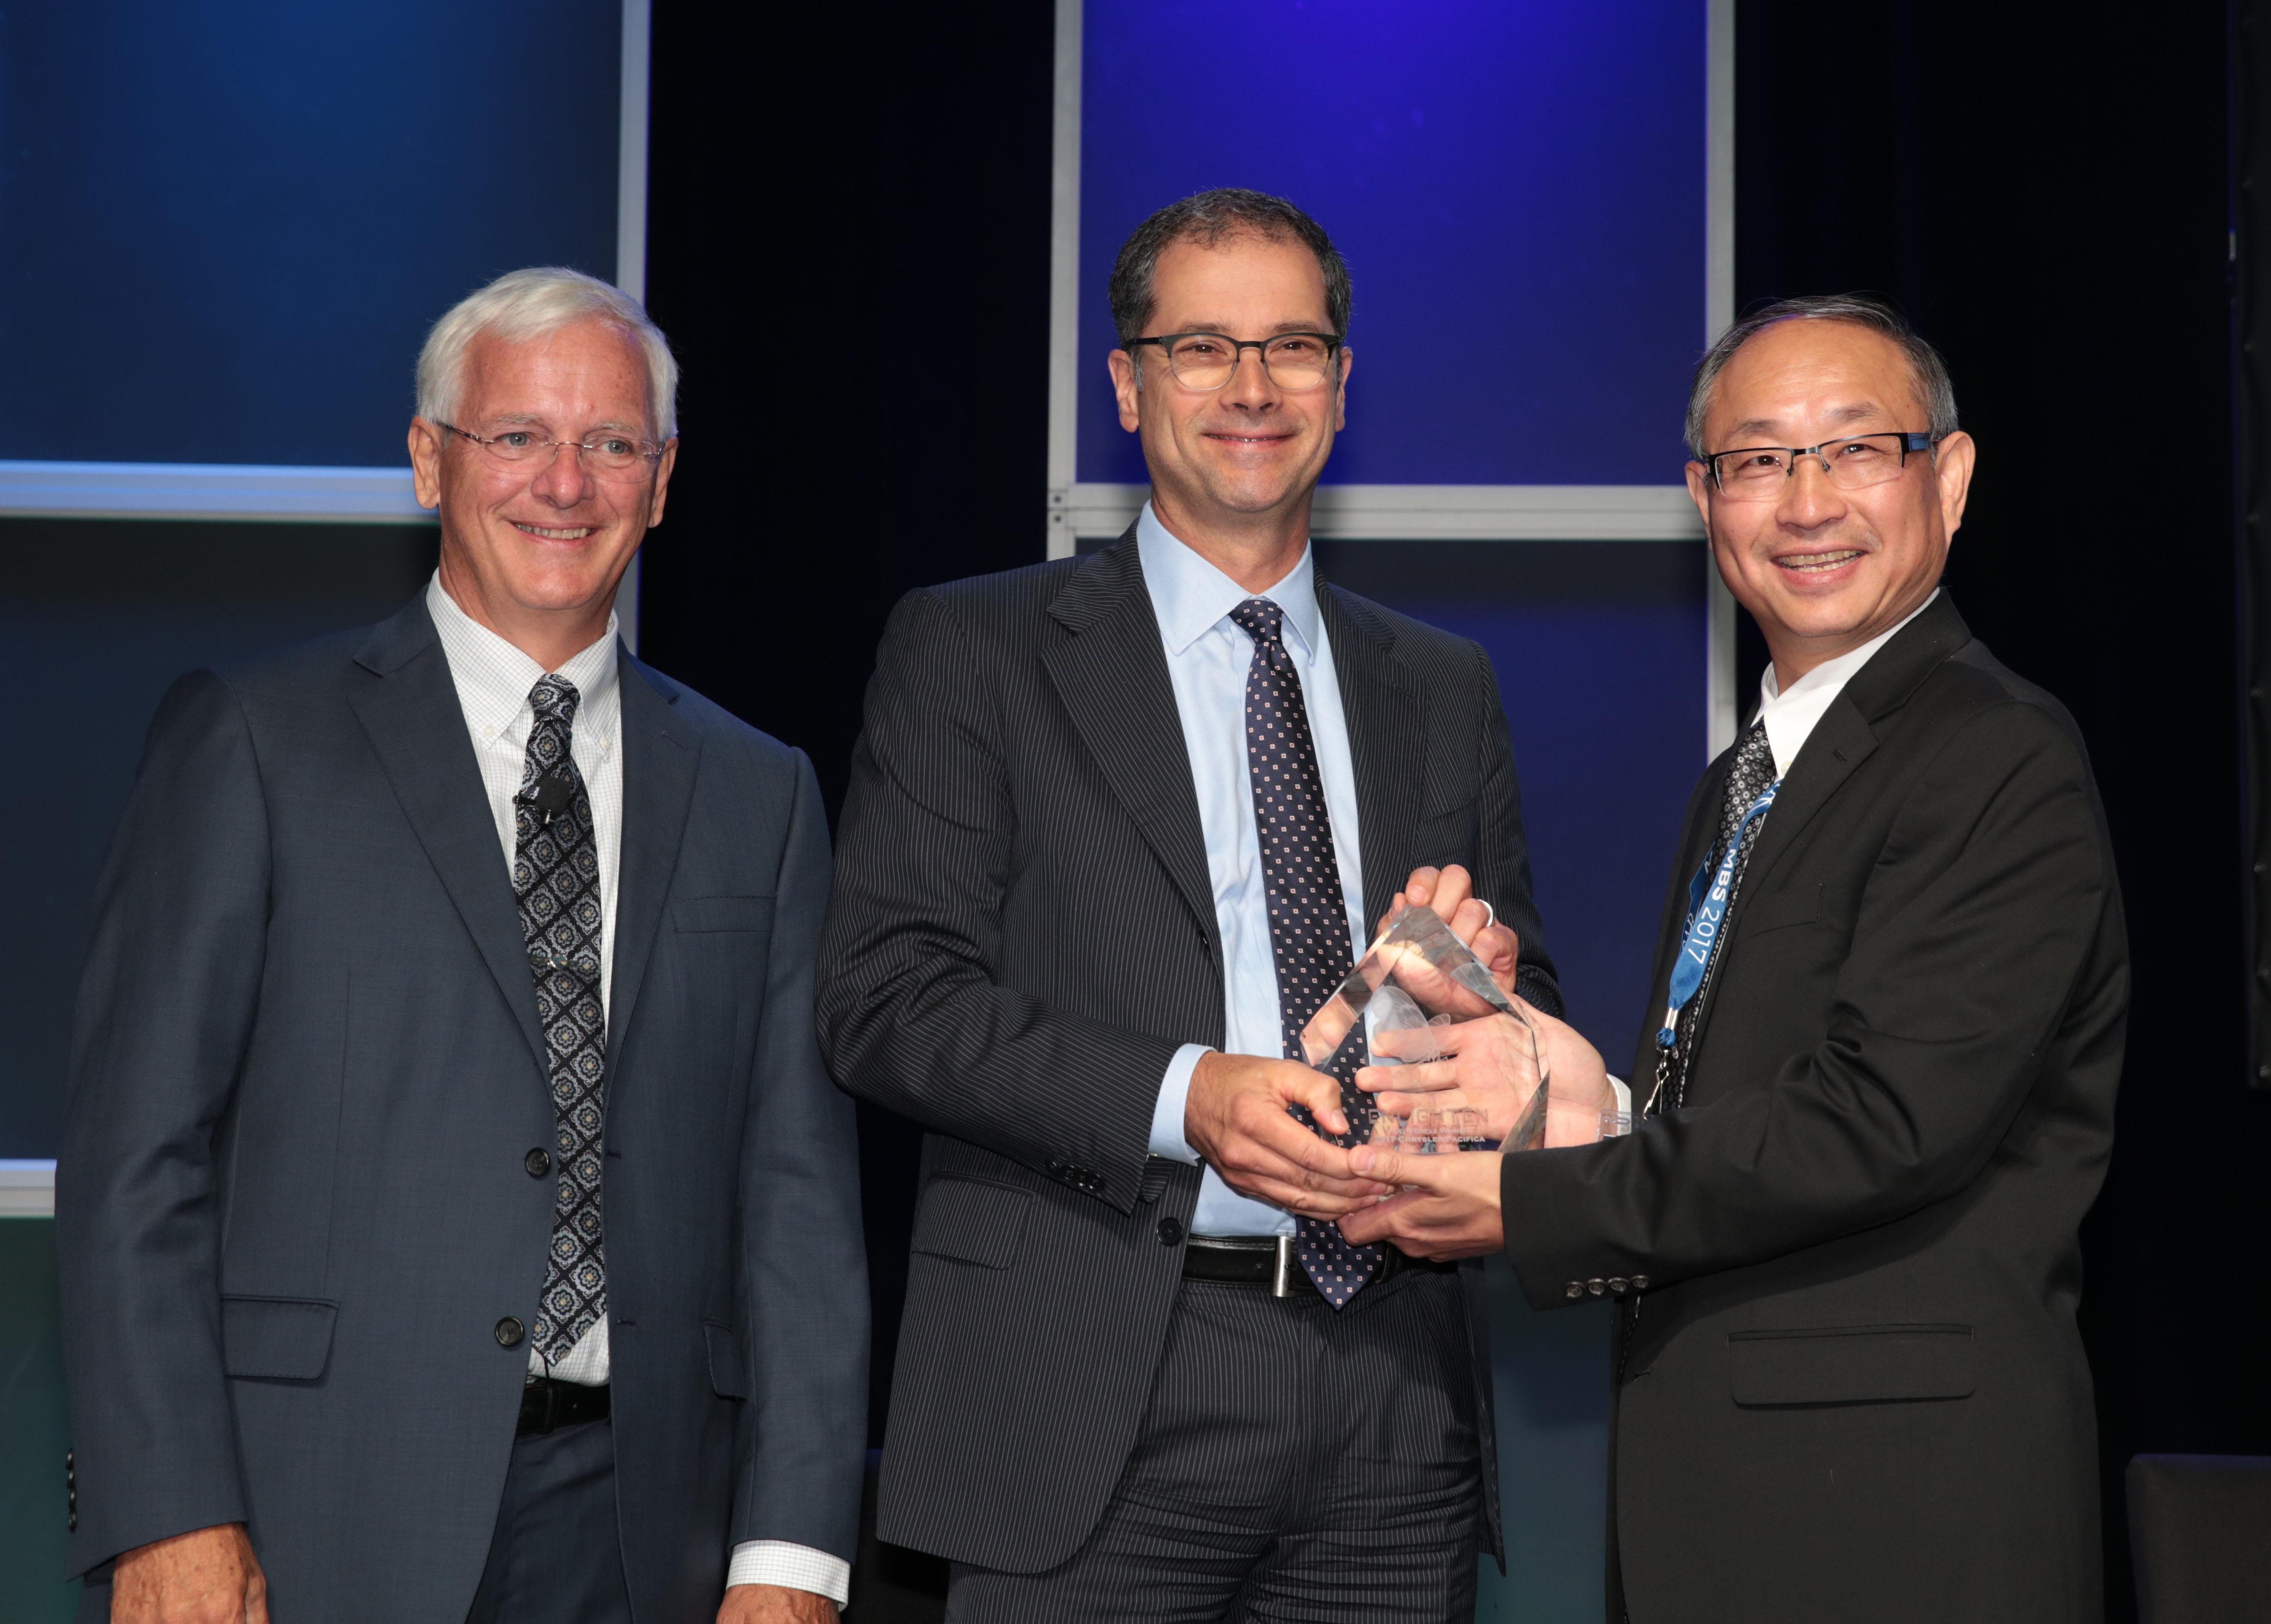 Award_MBS17_049.jpg